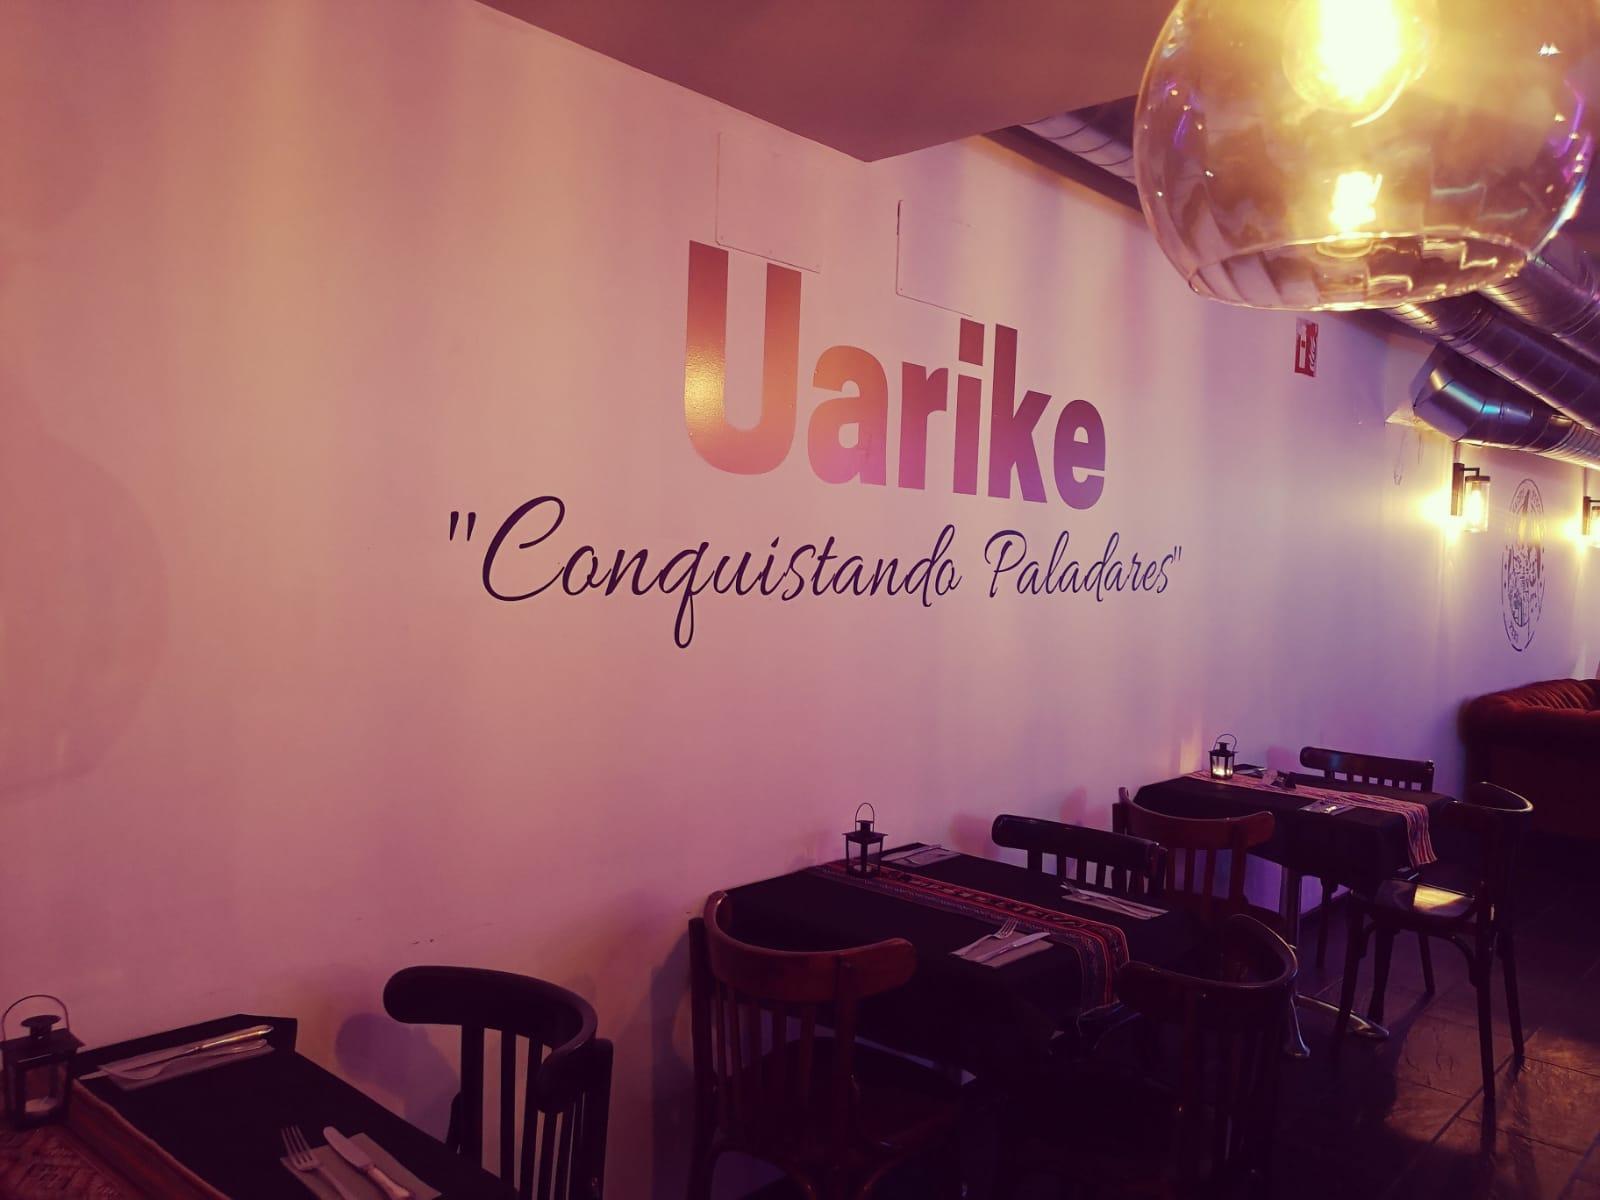 Restaurante Uarike